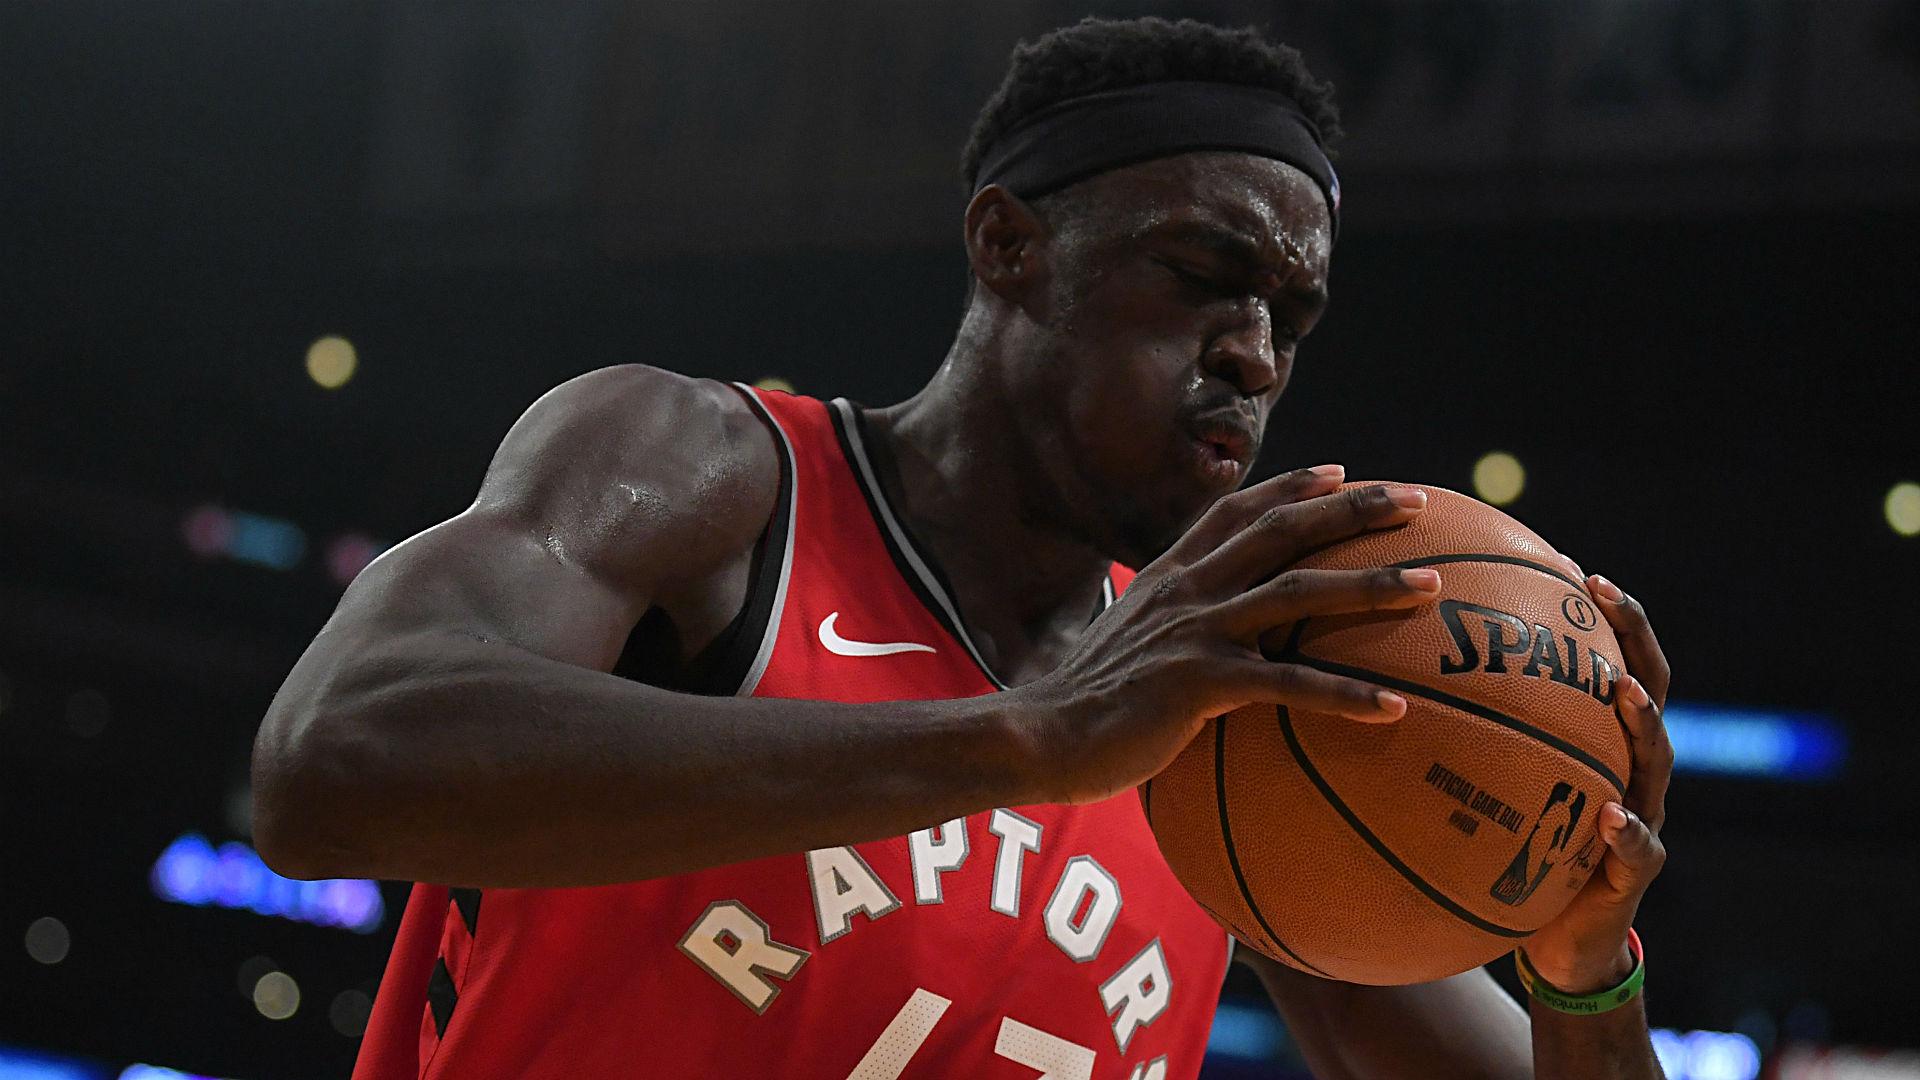 Pascal Siakam injury update: Raptors forward has surgery, could miss start of 2021-22 season